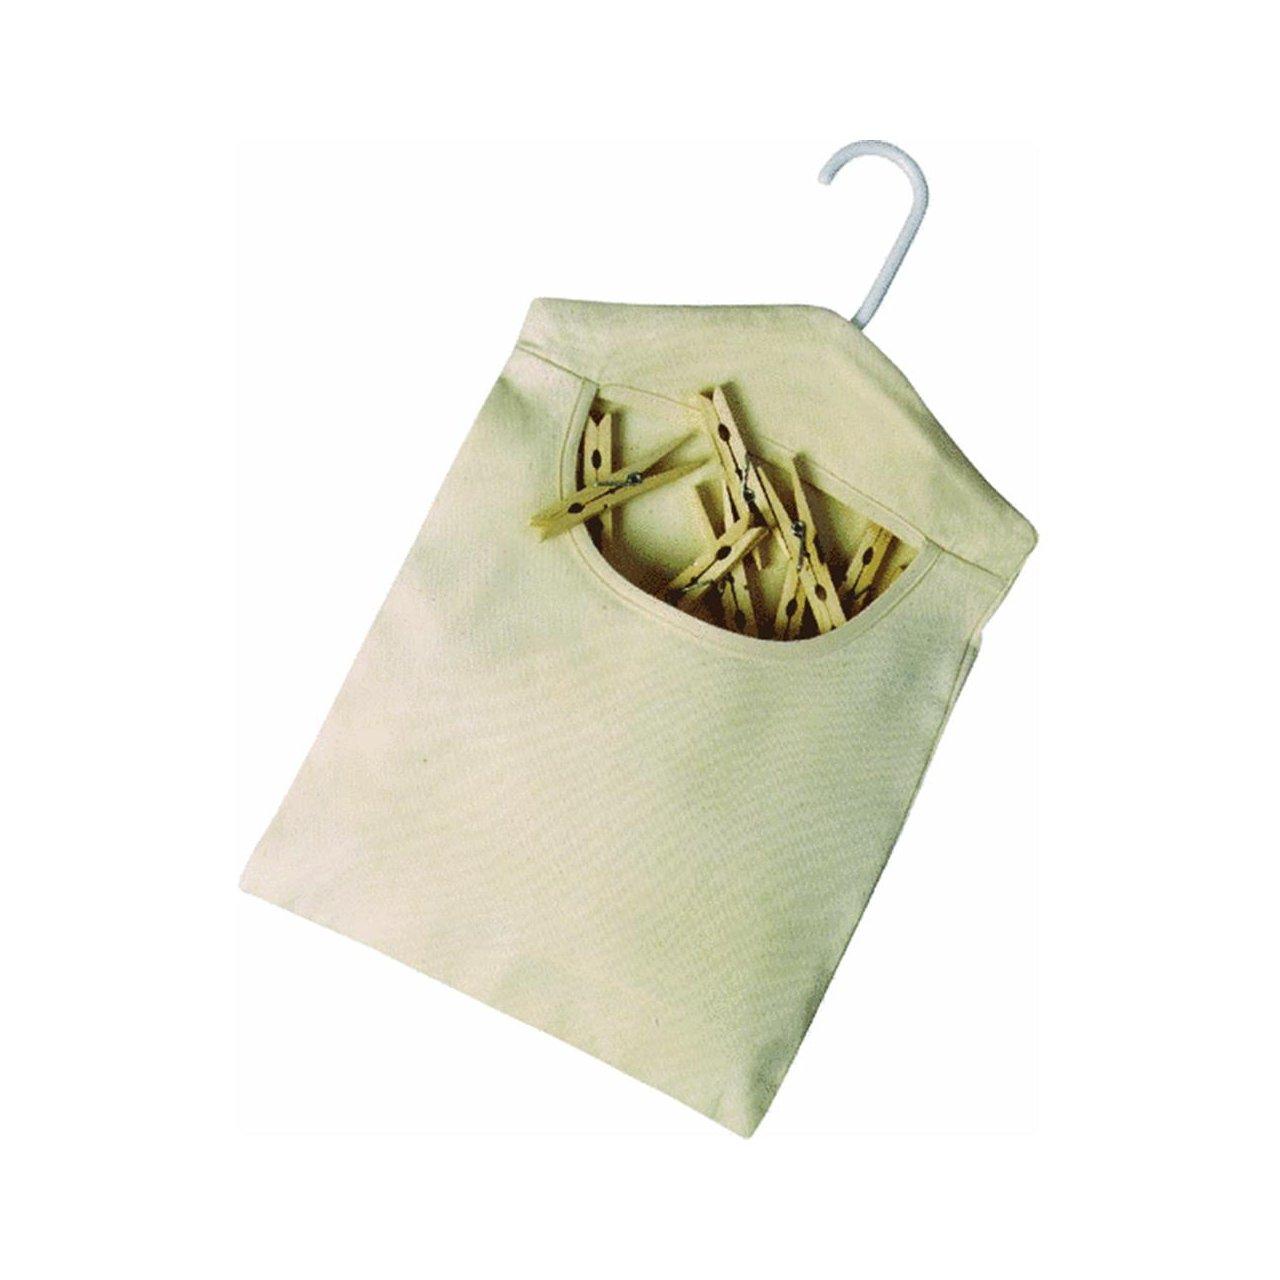 Homz/Seymour 1220049 11X15 Clothespin Bag 2